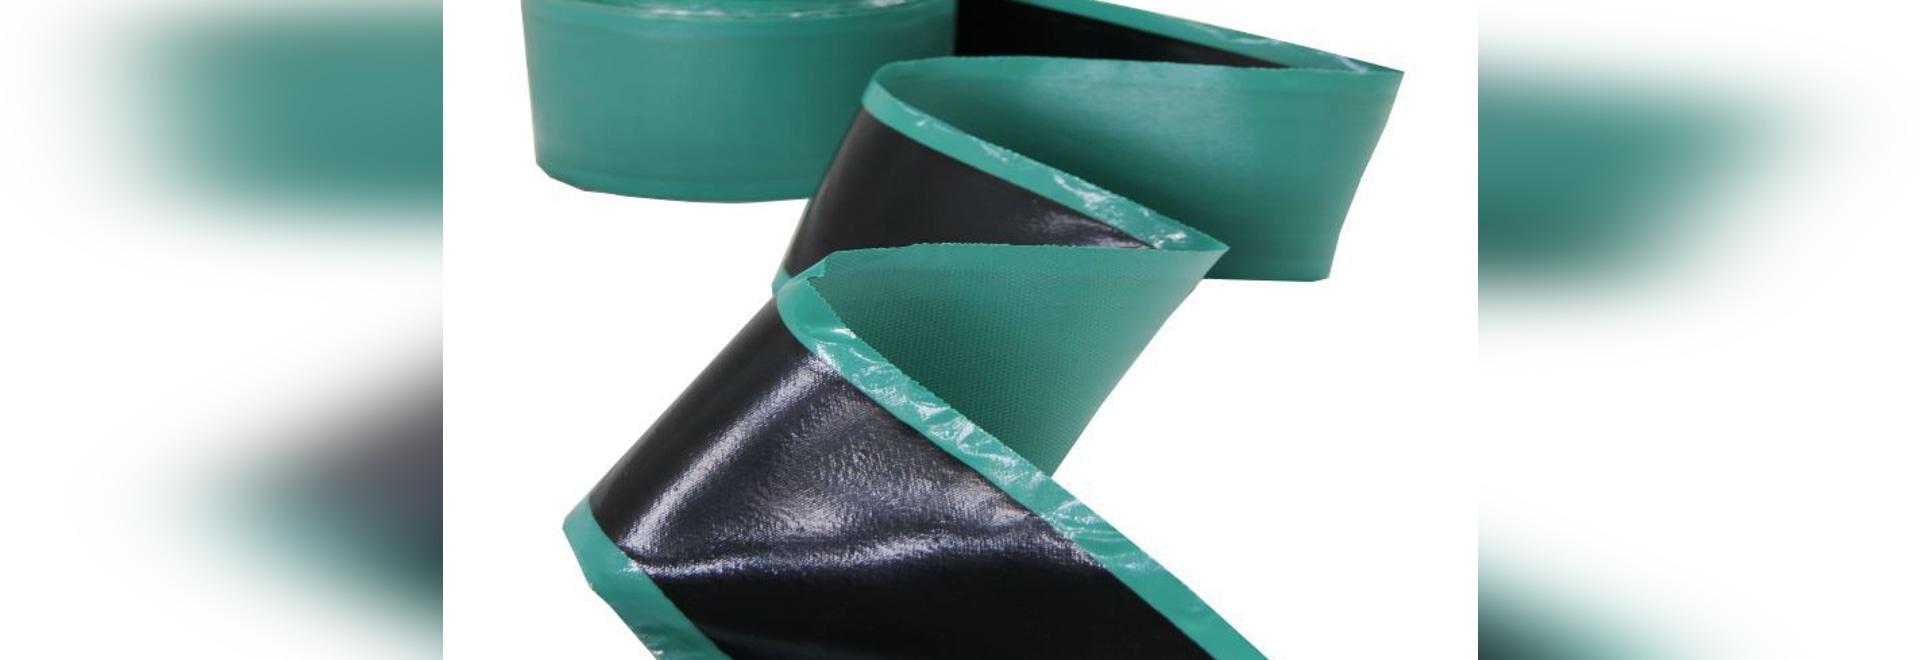 Reparaturbänder